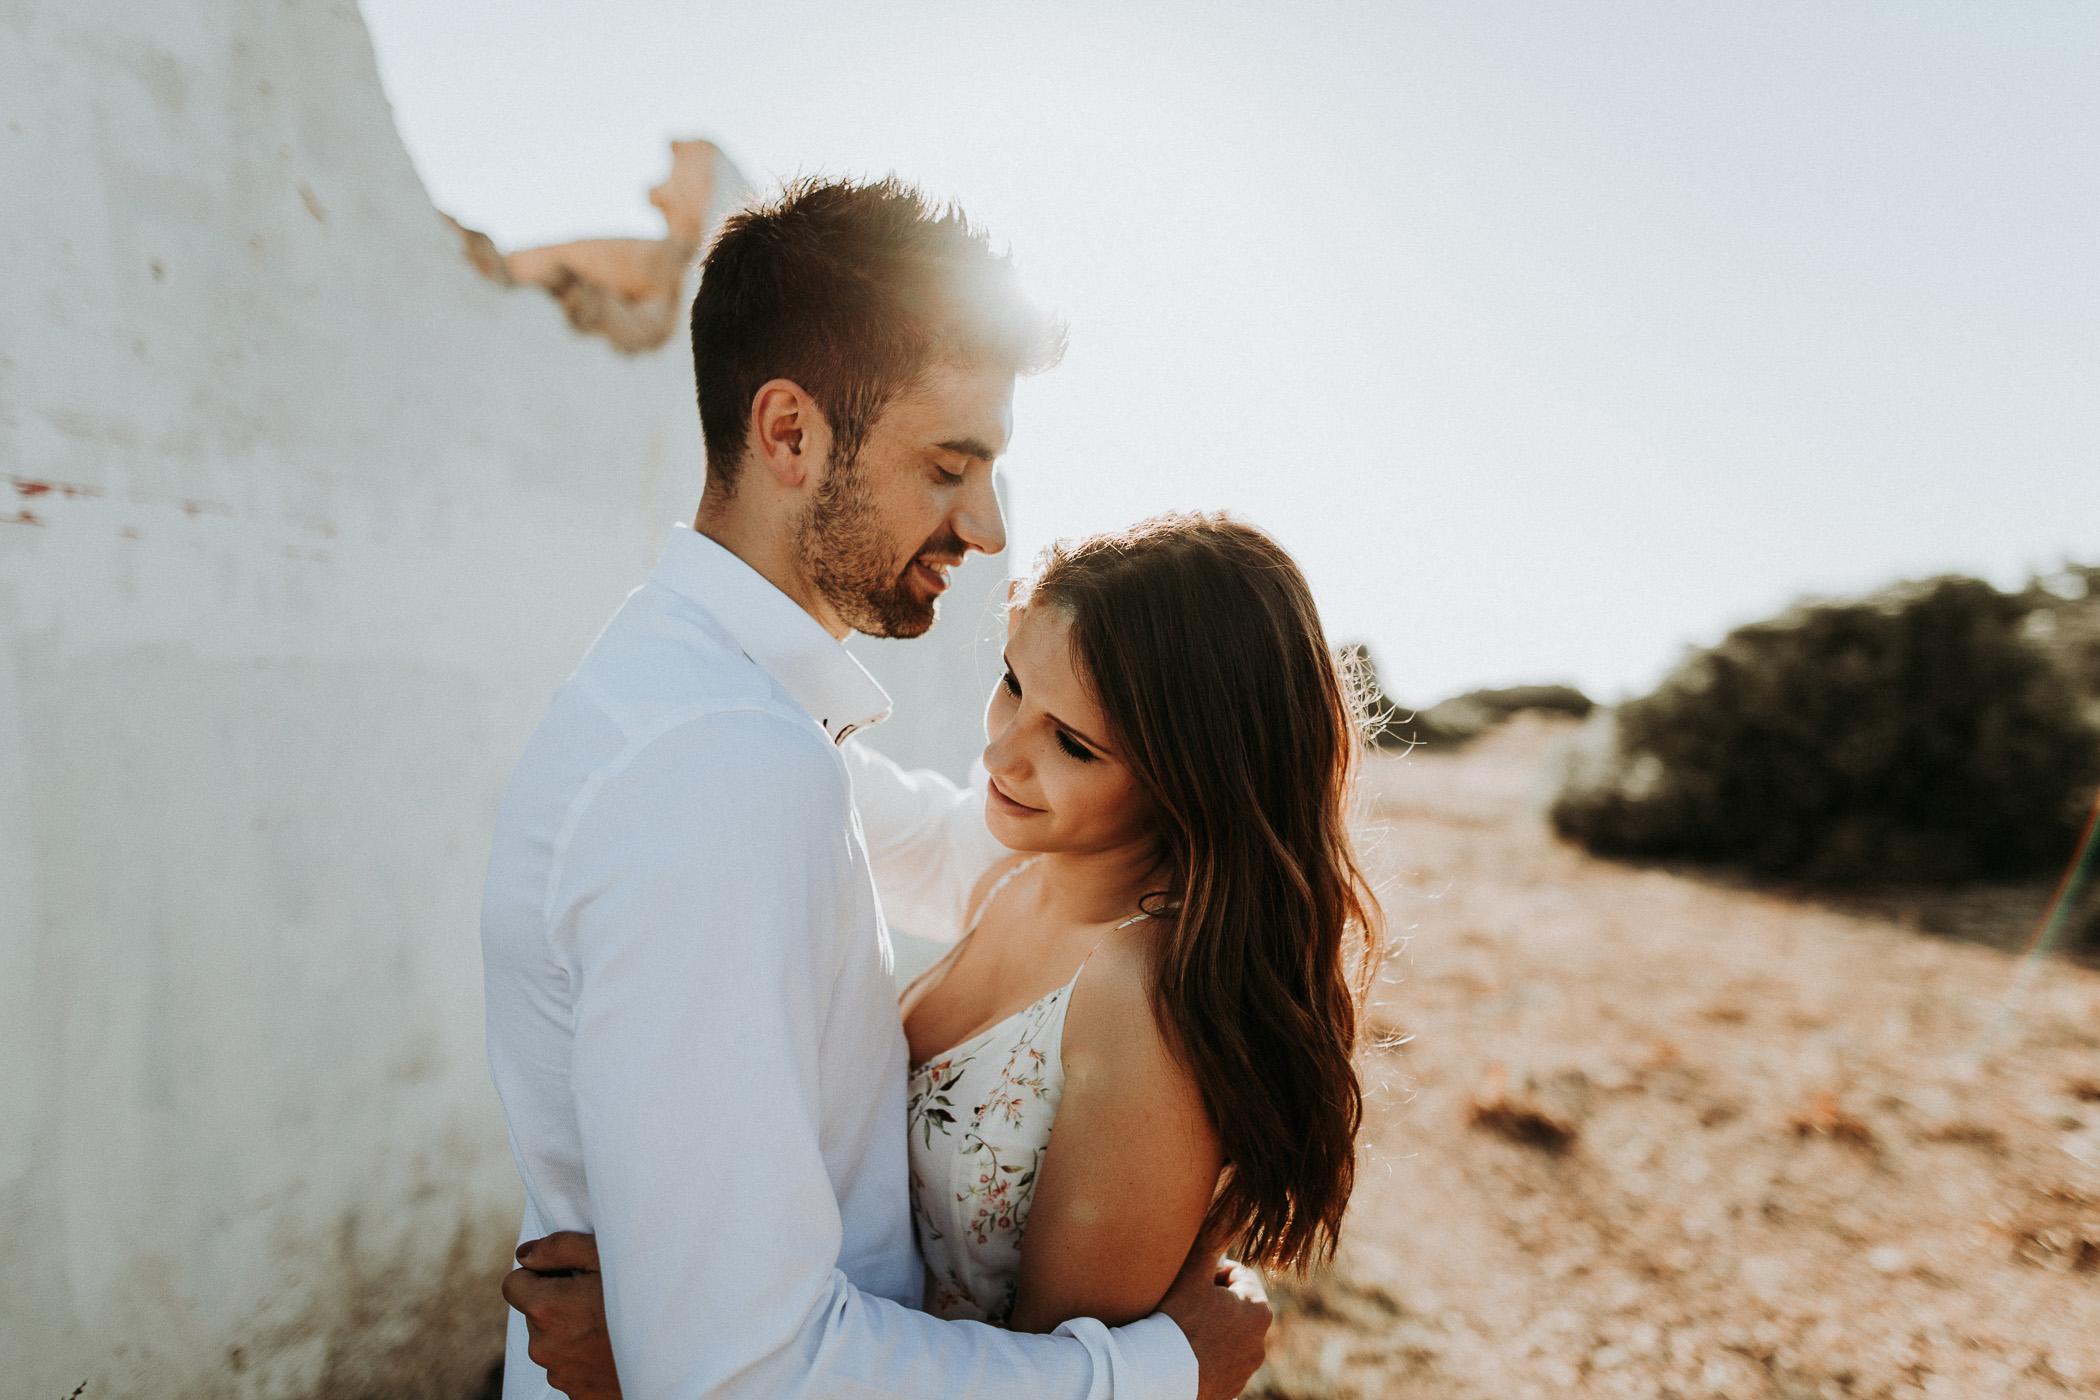 DanielaMarquardtPhotography_wedding_elopement_mallorca_spain_calapi_palma_lauraandtoni_369